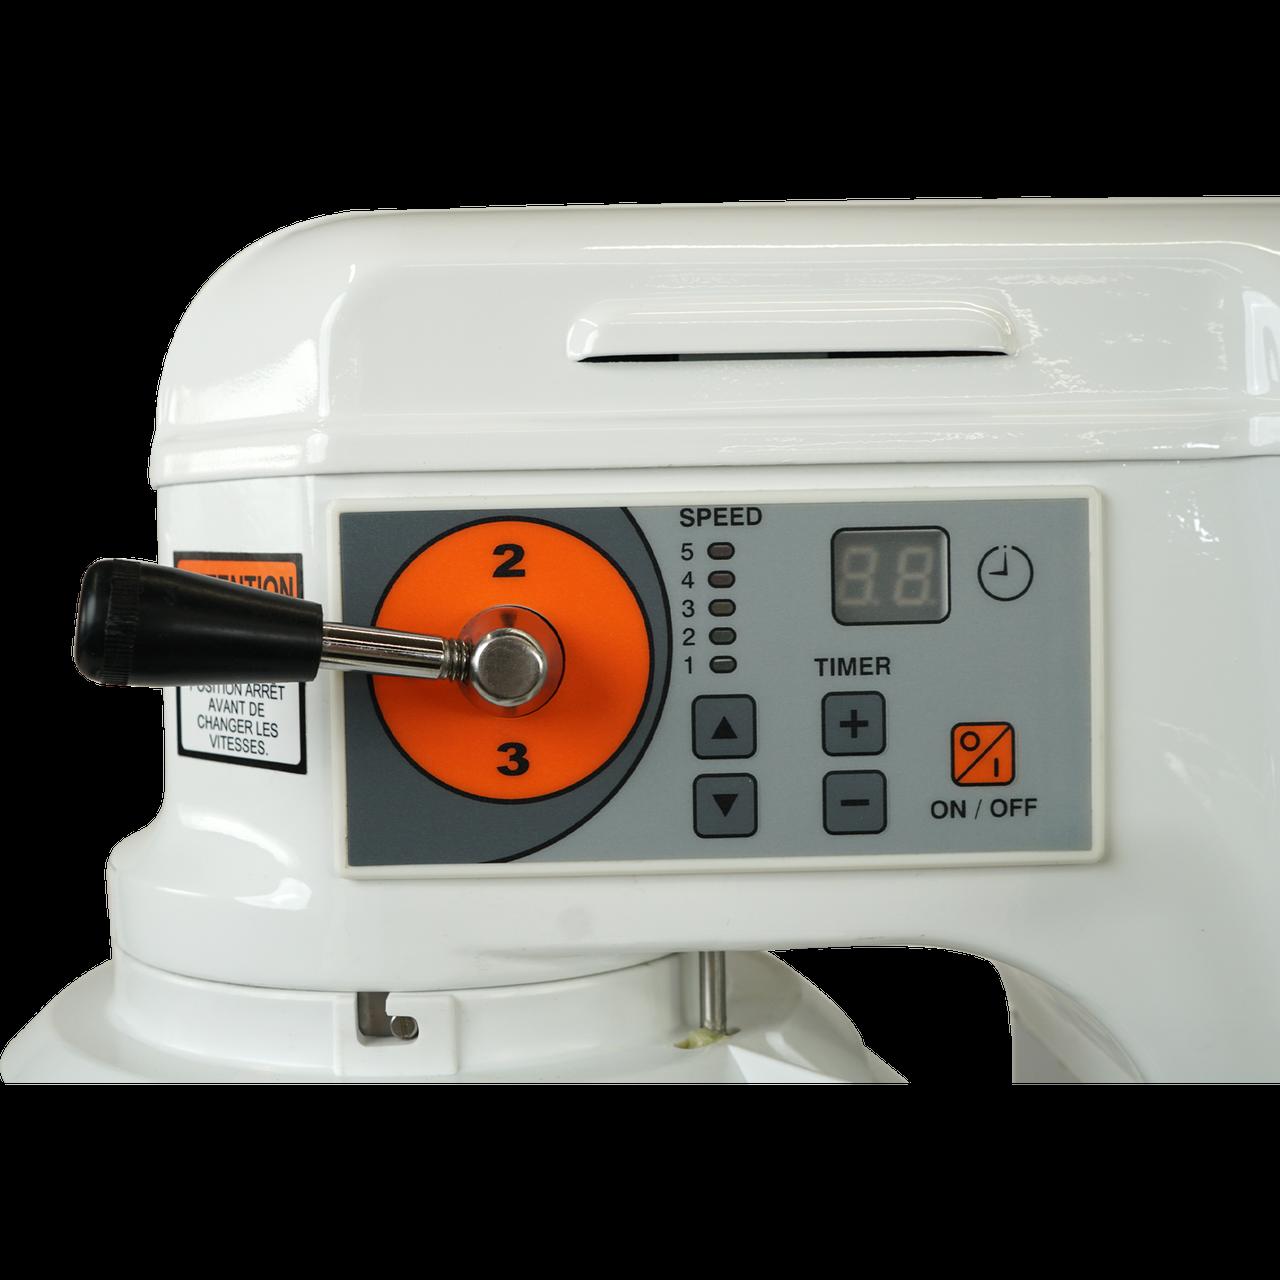 Gear Shift Lever, Digital Timer, Speed Control, AE-10DCA 10 Quart Countertop Planetary Mixer, Commercial Mixer